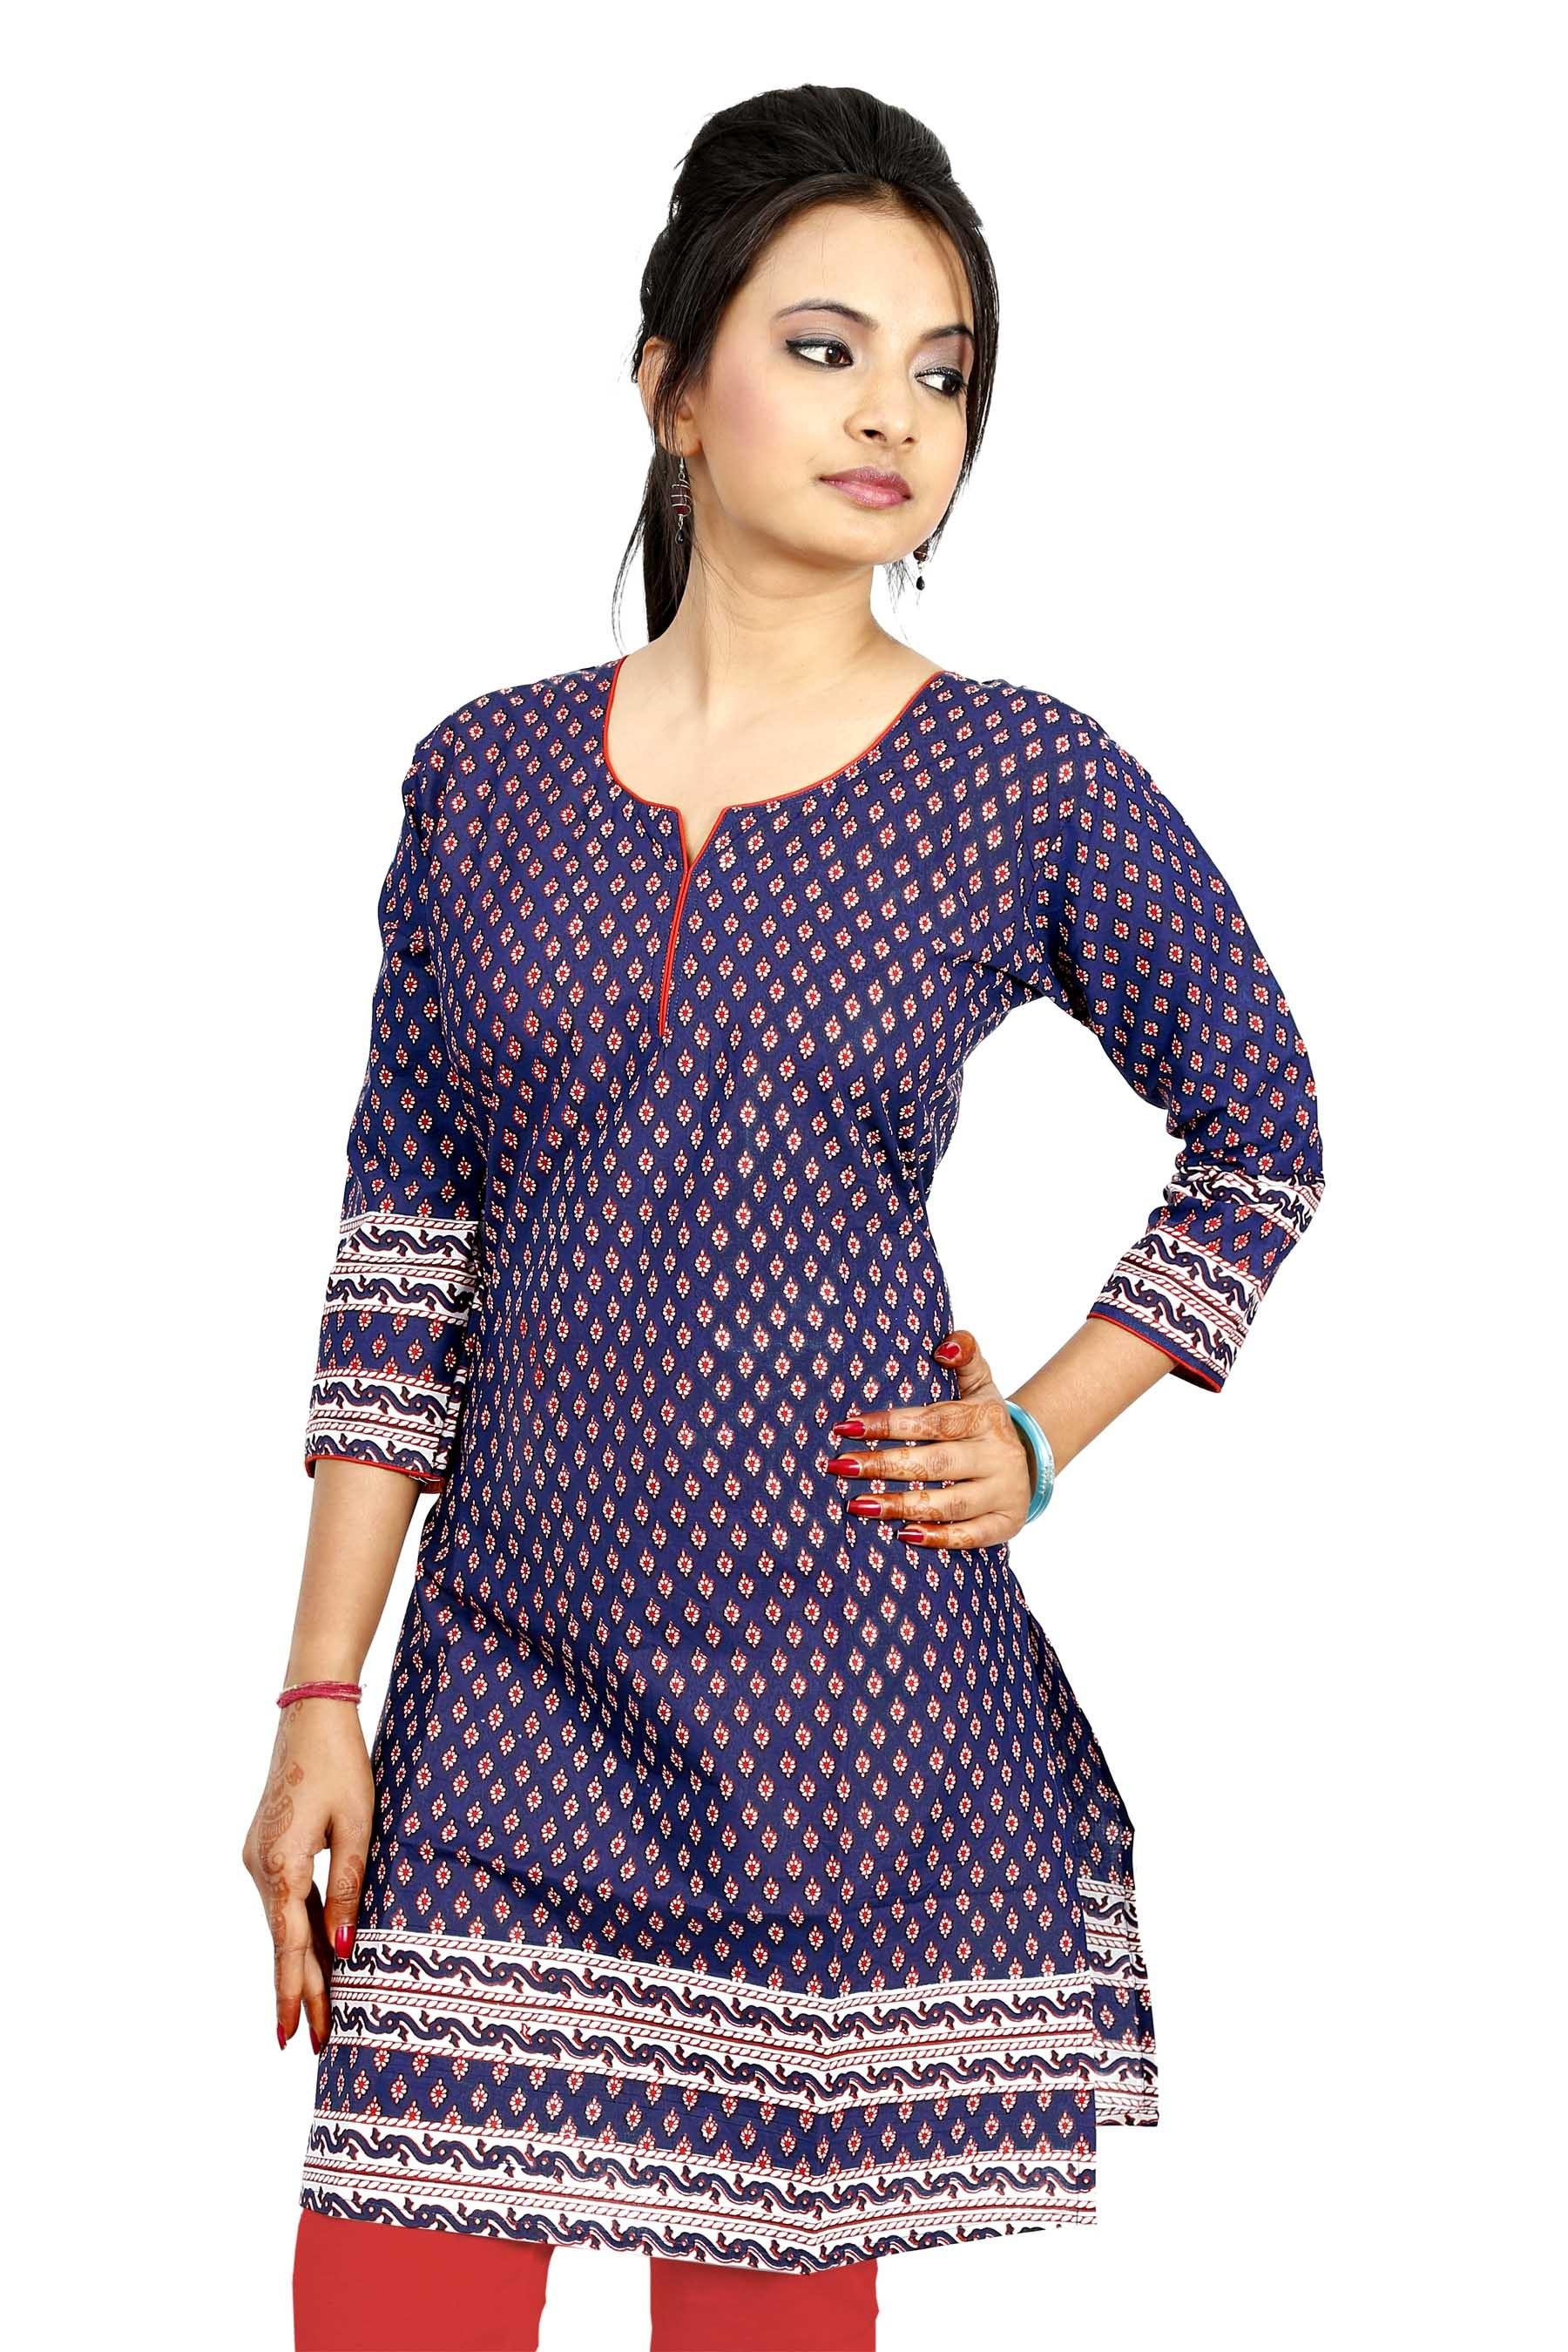 New Beautiful Cotton Ethnic Women Fashion Stylish Kurti Indian Kurta Tunic Top Kaftan-Clothing ...